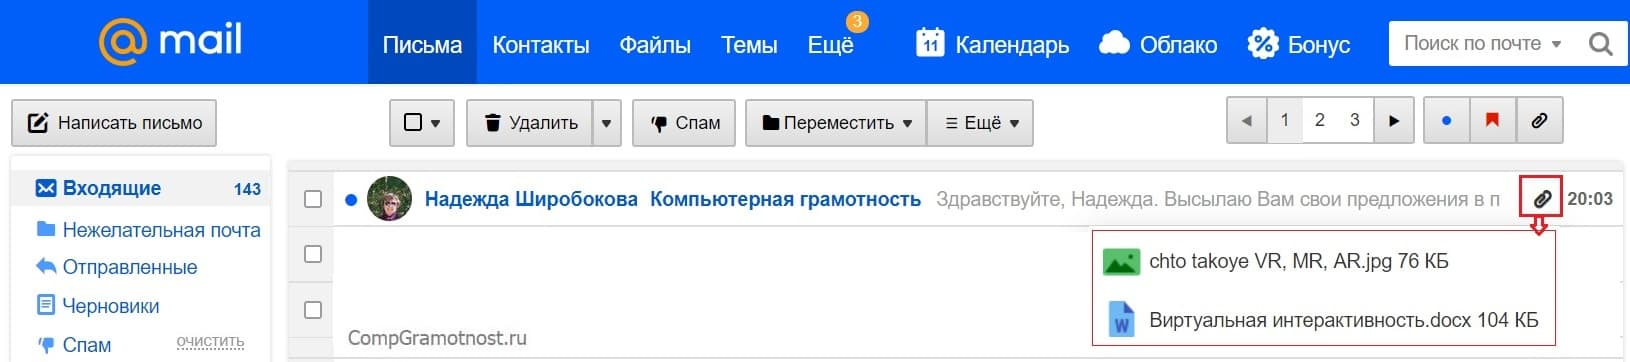 к письму в почте mail ru прикреплен файл